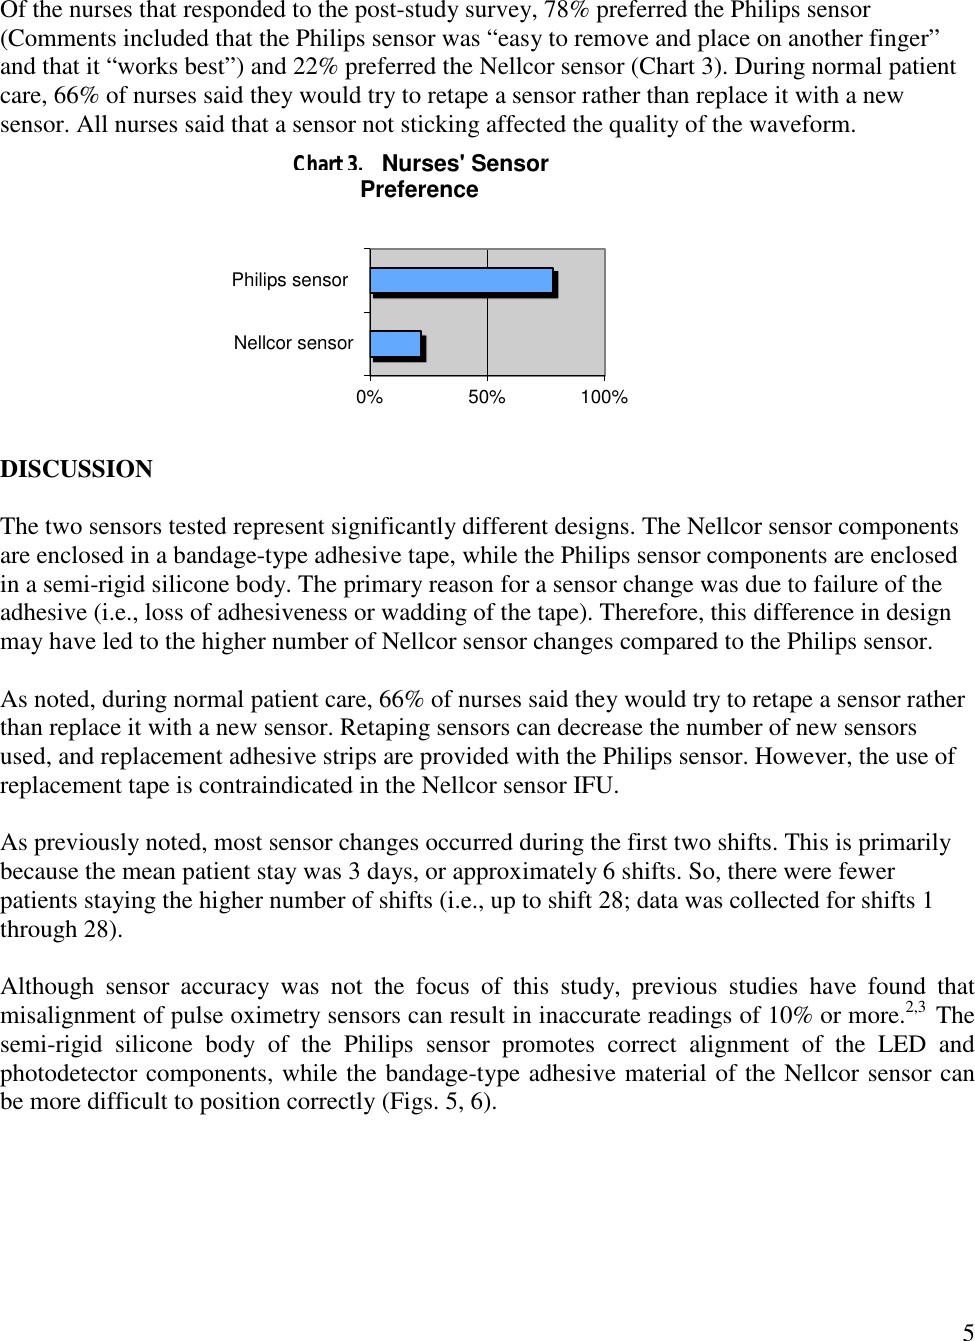 Philips M1131A User Manual Imonial Sensordurabilitystudy